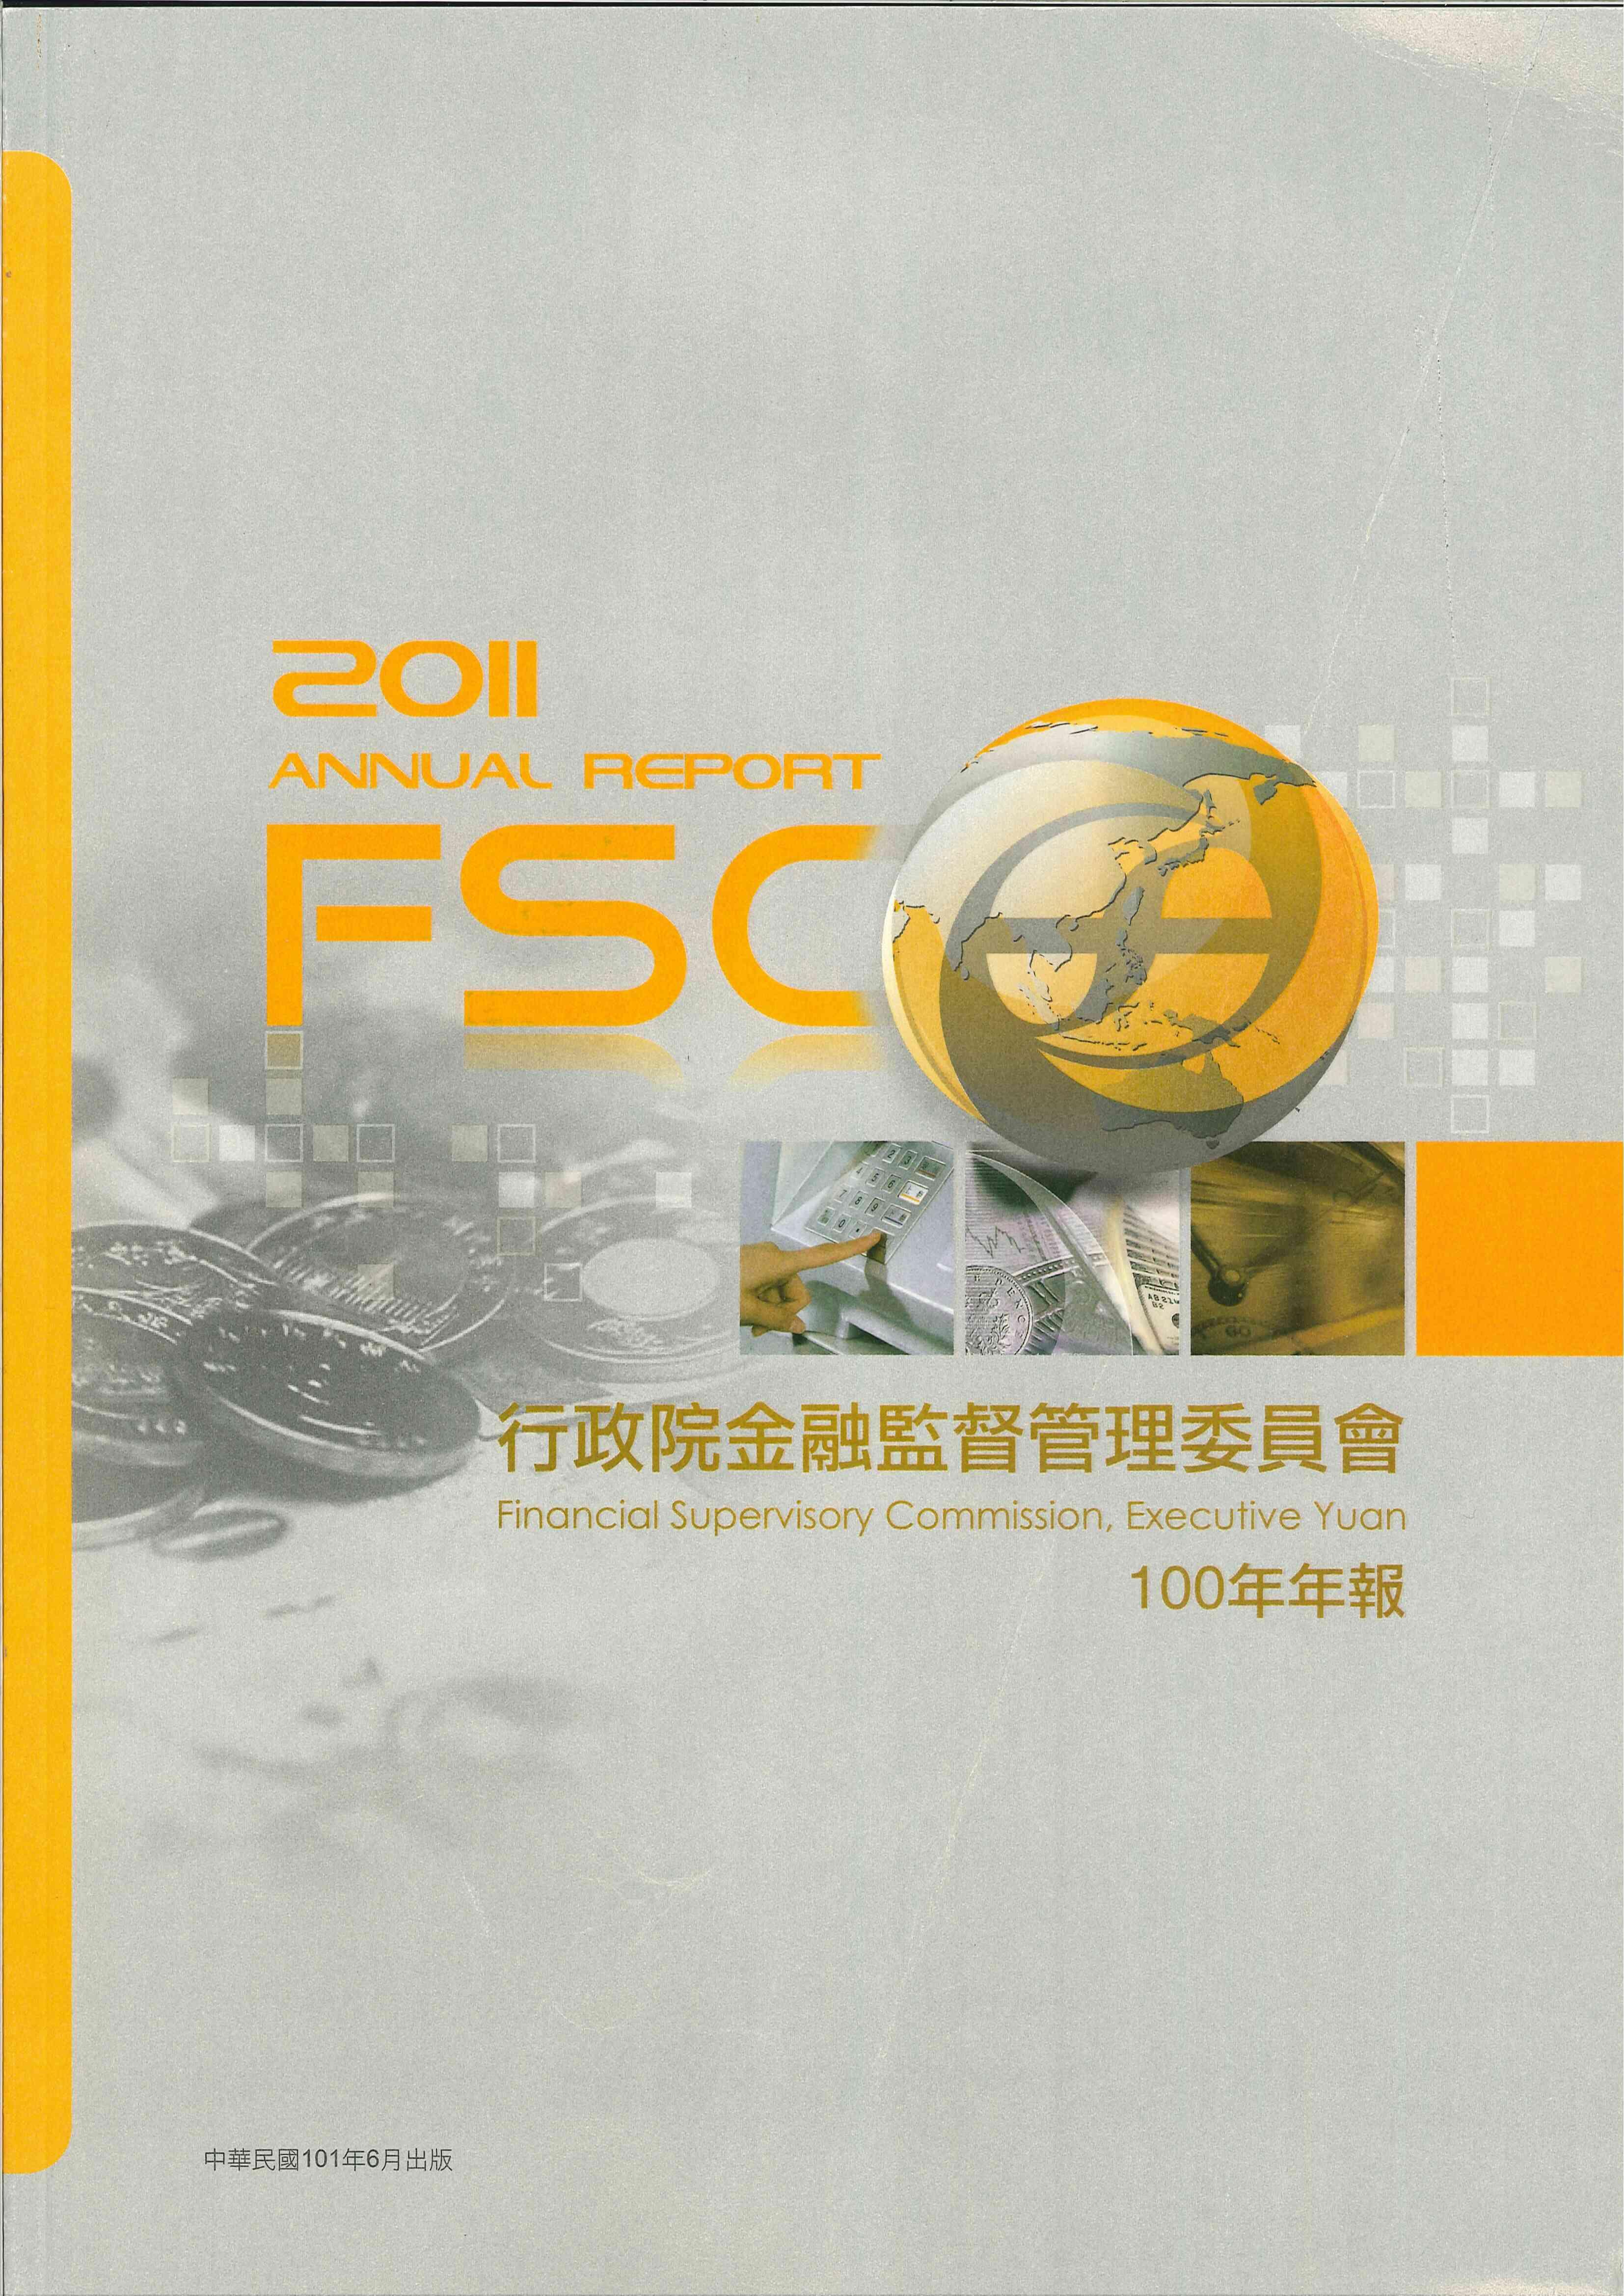 投資臺灣招商說明大會:活動實錄=Investment promotion meetings in Taiwan